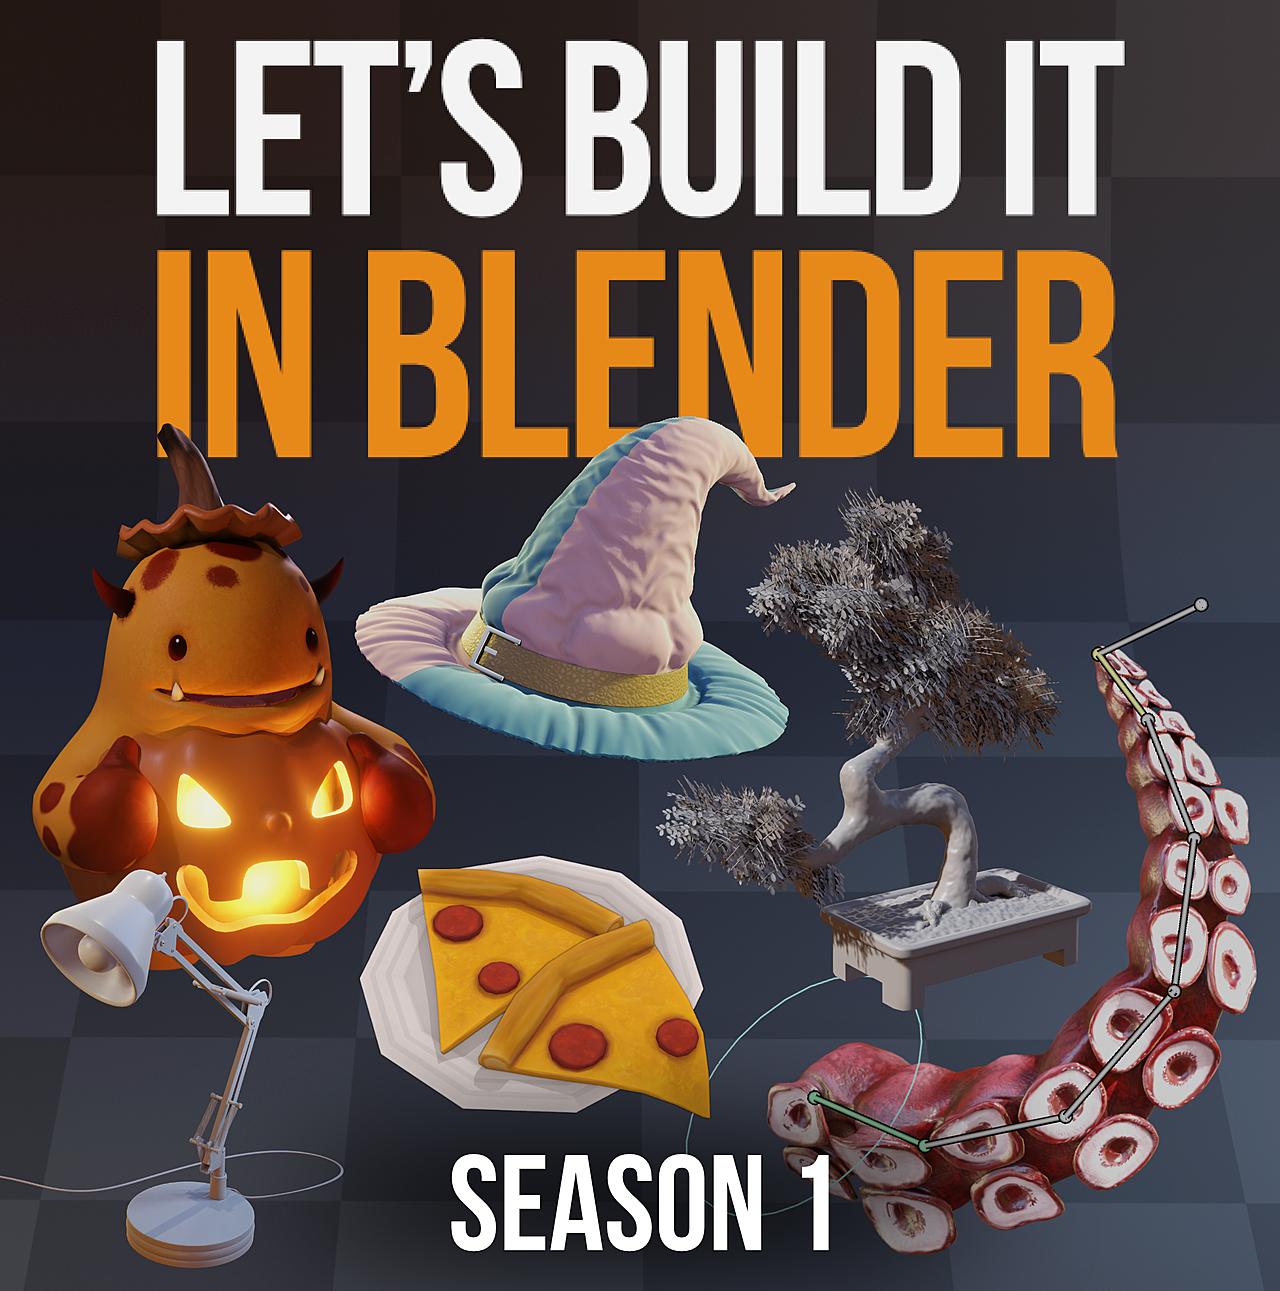 Let's Build It In Blender - Season 1